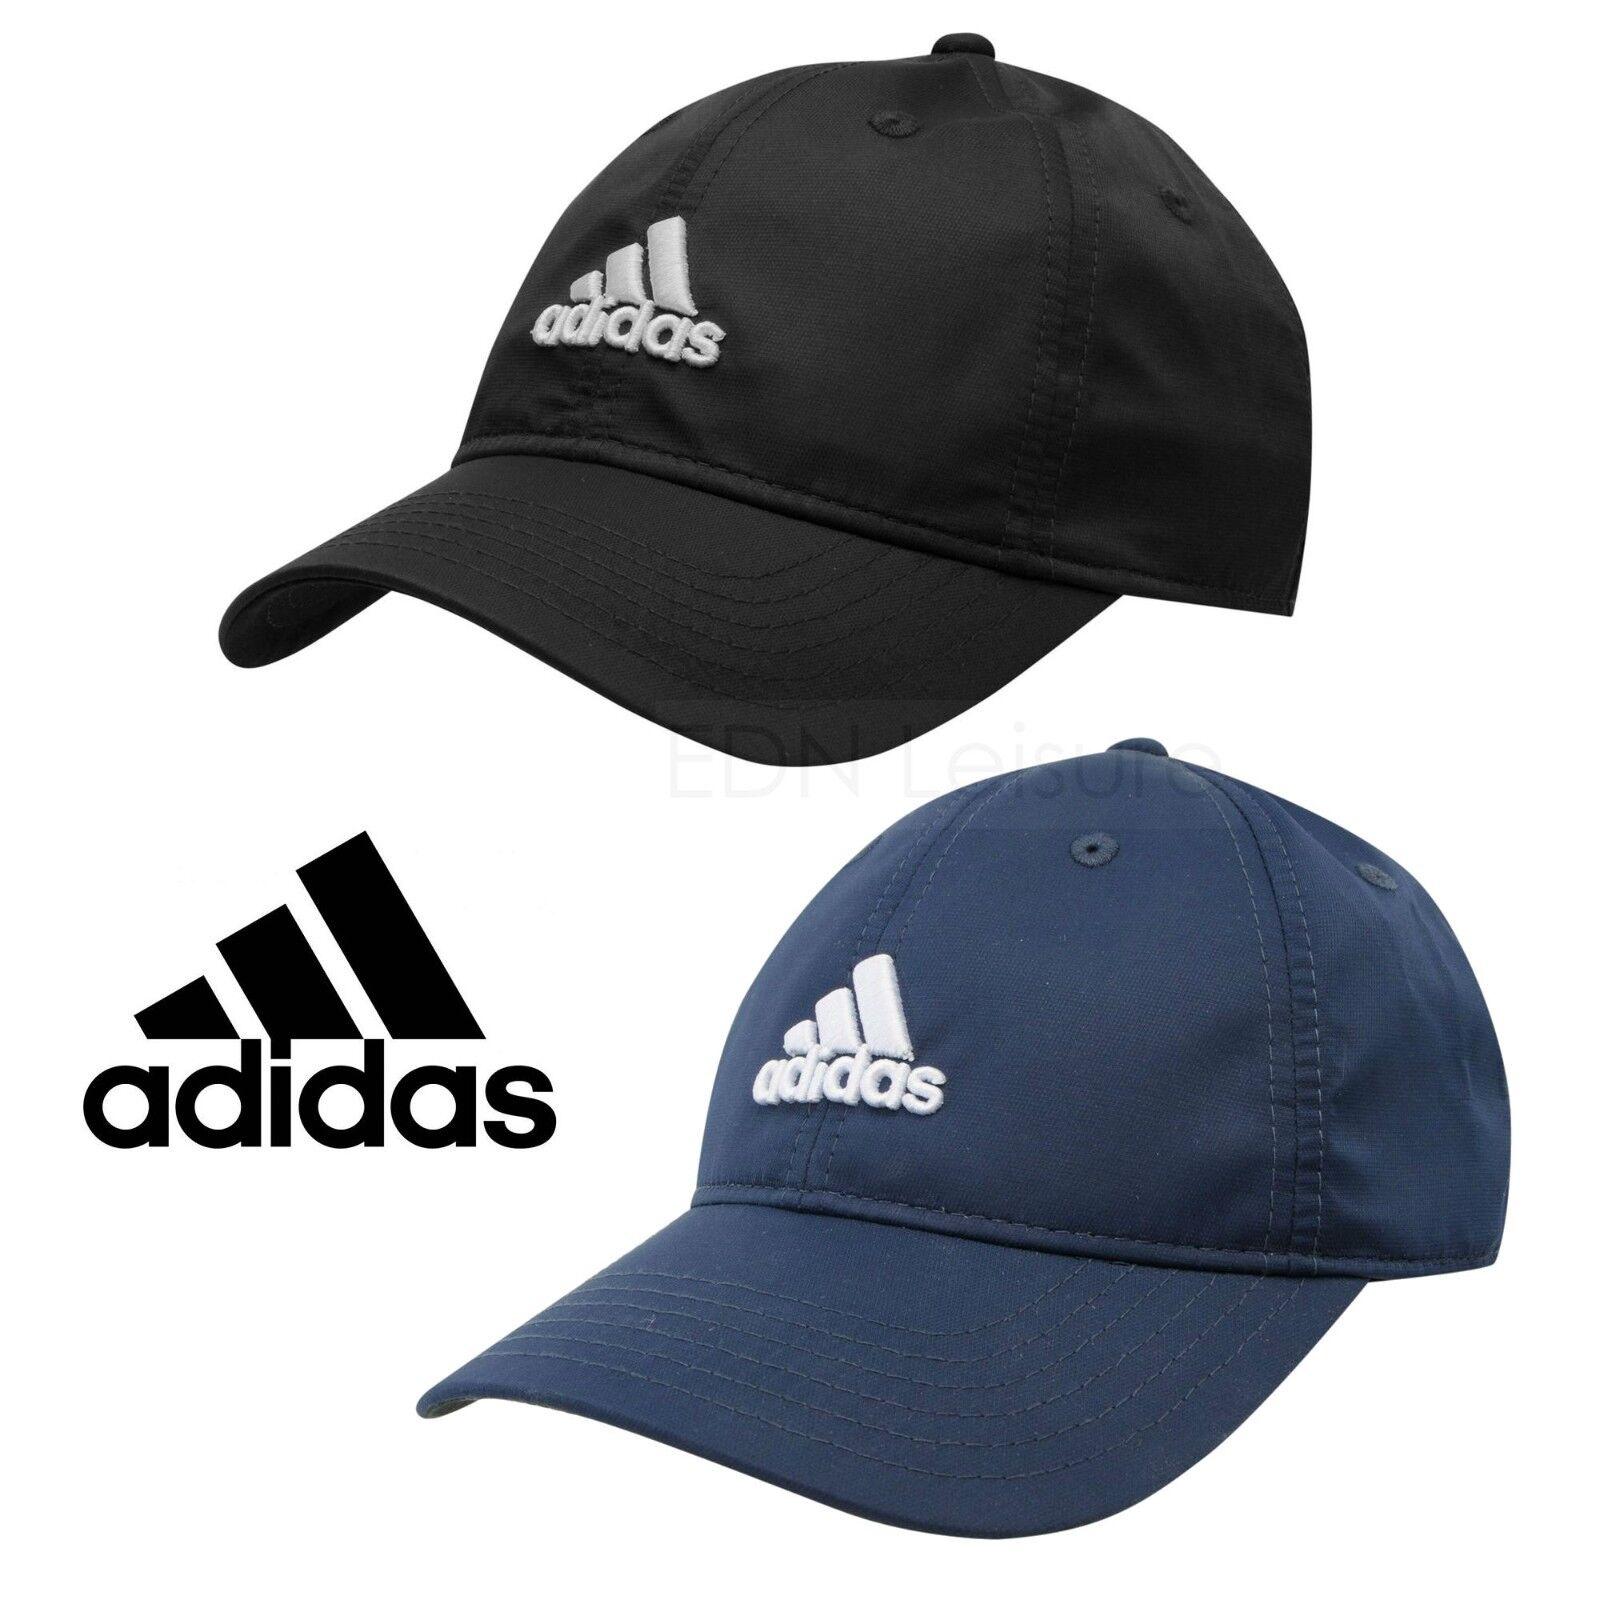 Junior Adidas Logo Kappe Jungen Mädchen Kinder Hut Laufen Golf Baseball